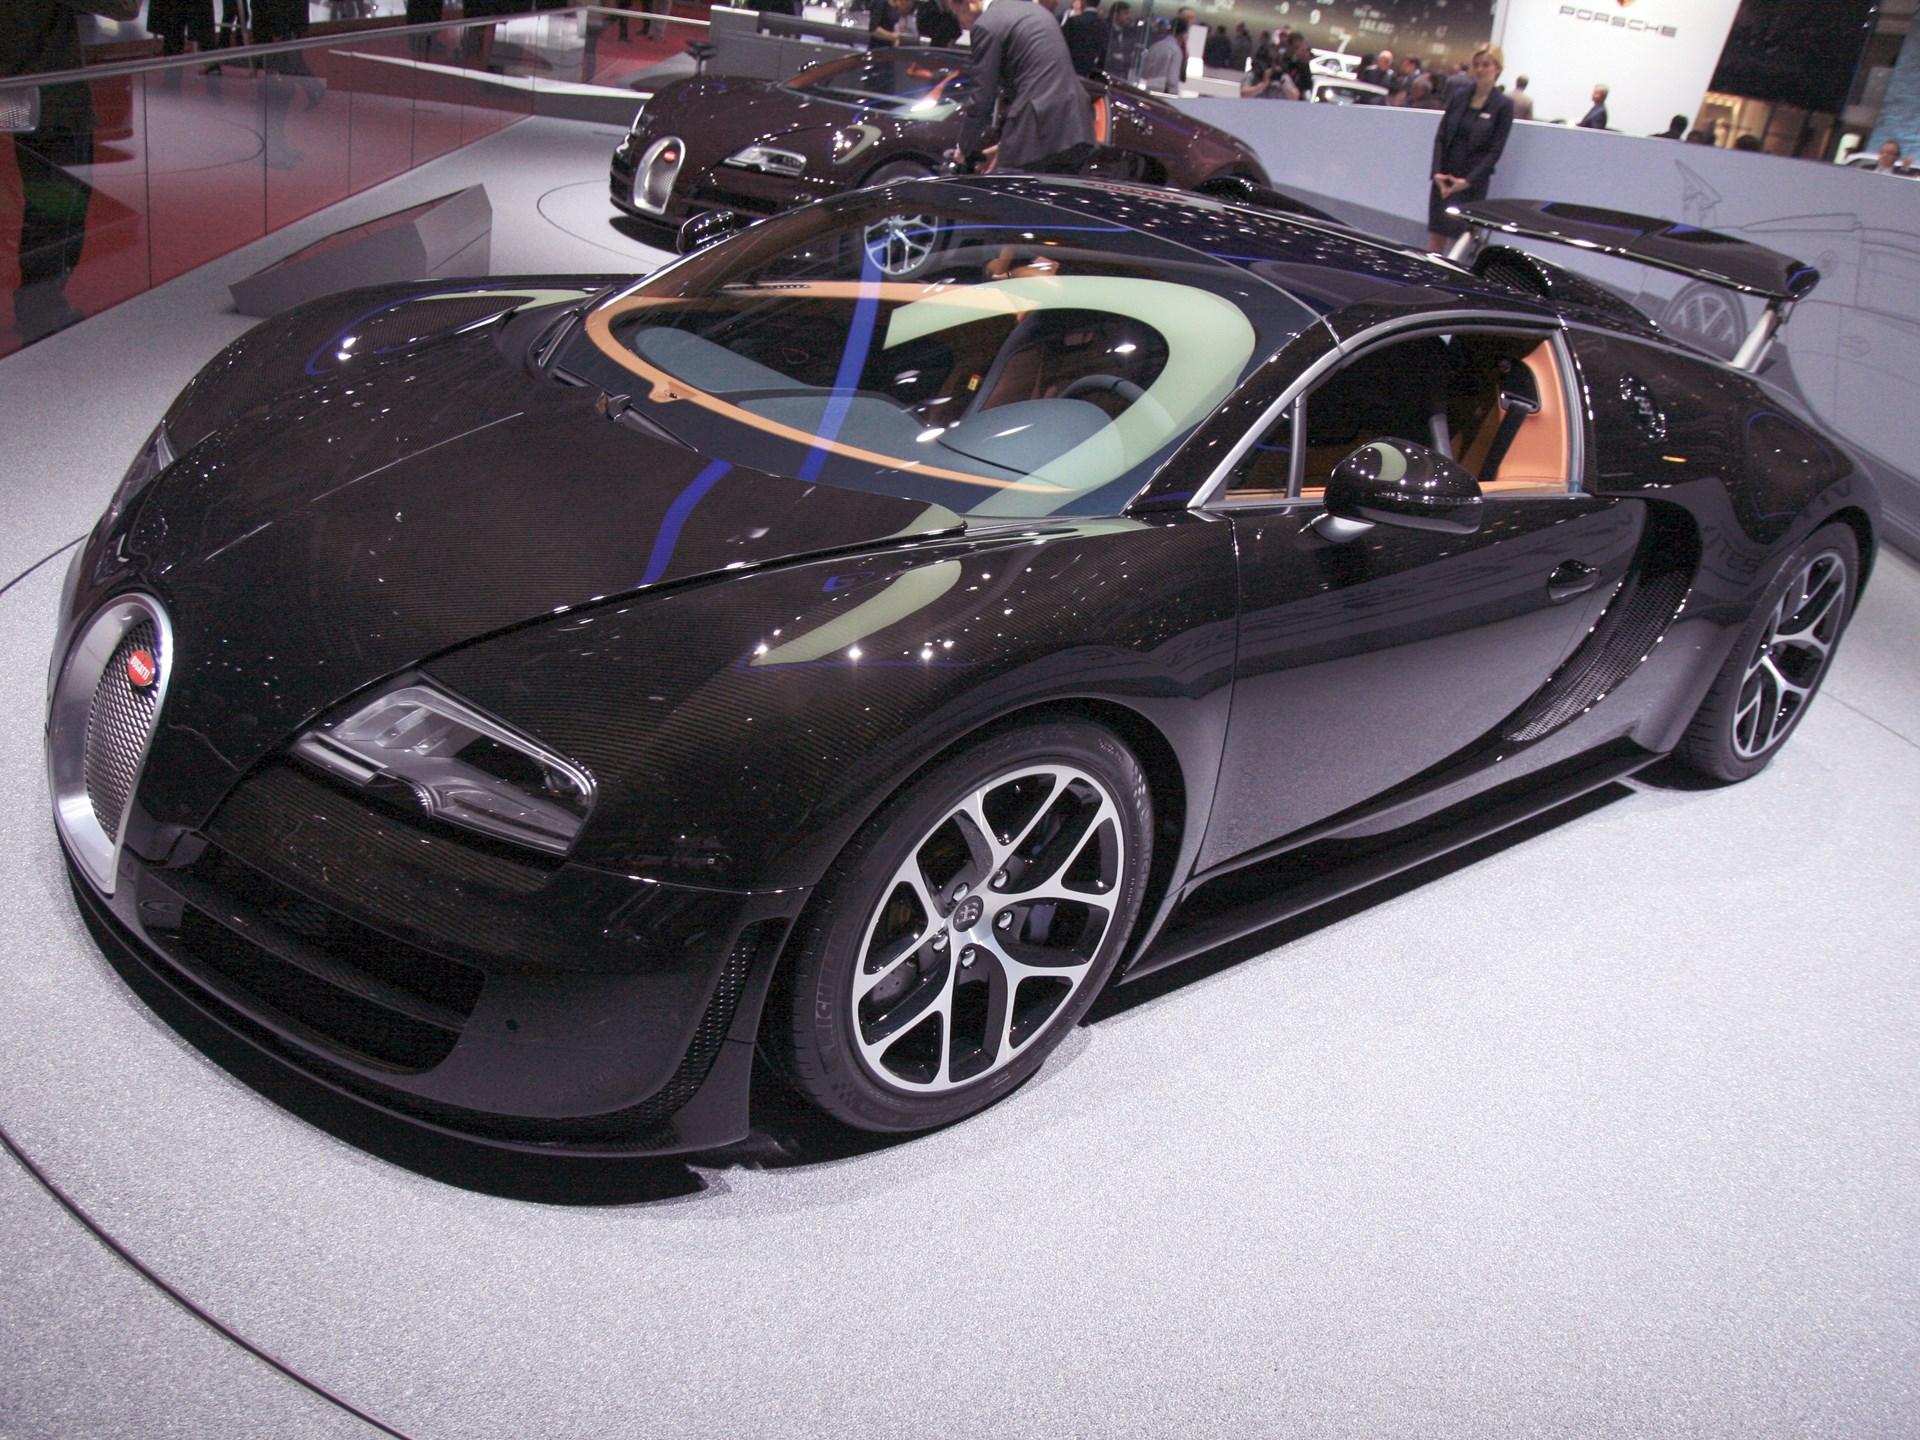 On display at the 2013 Geneva Motor Show.